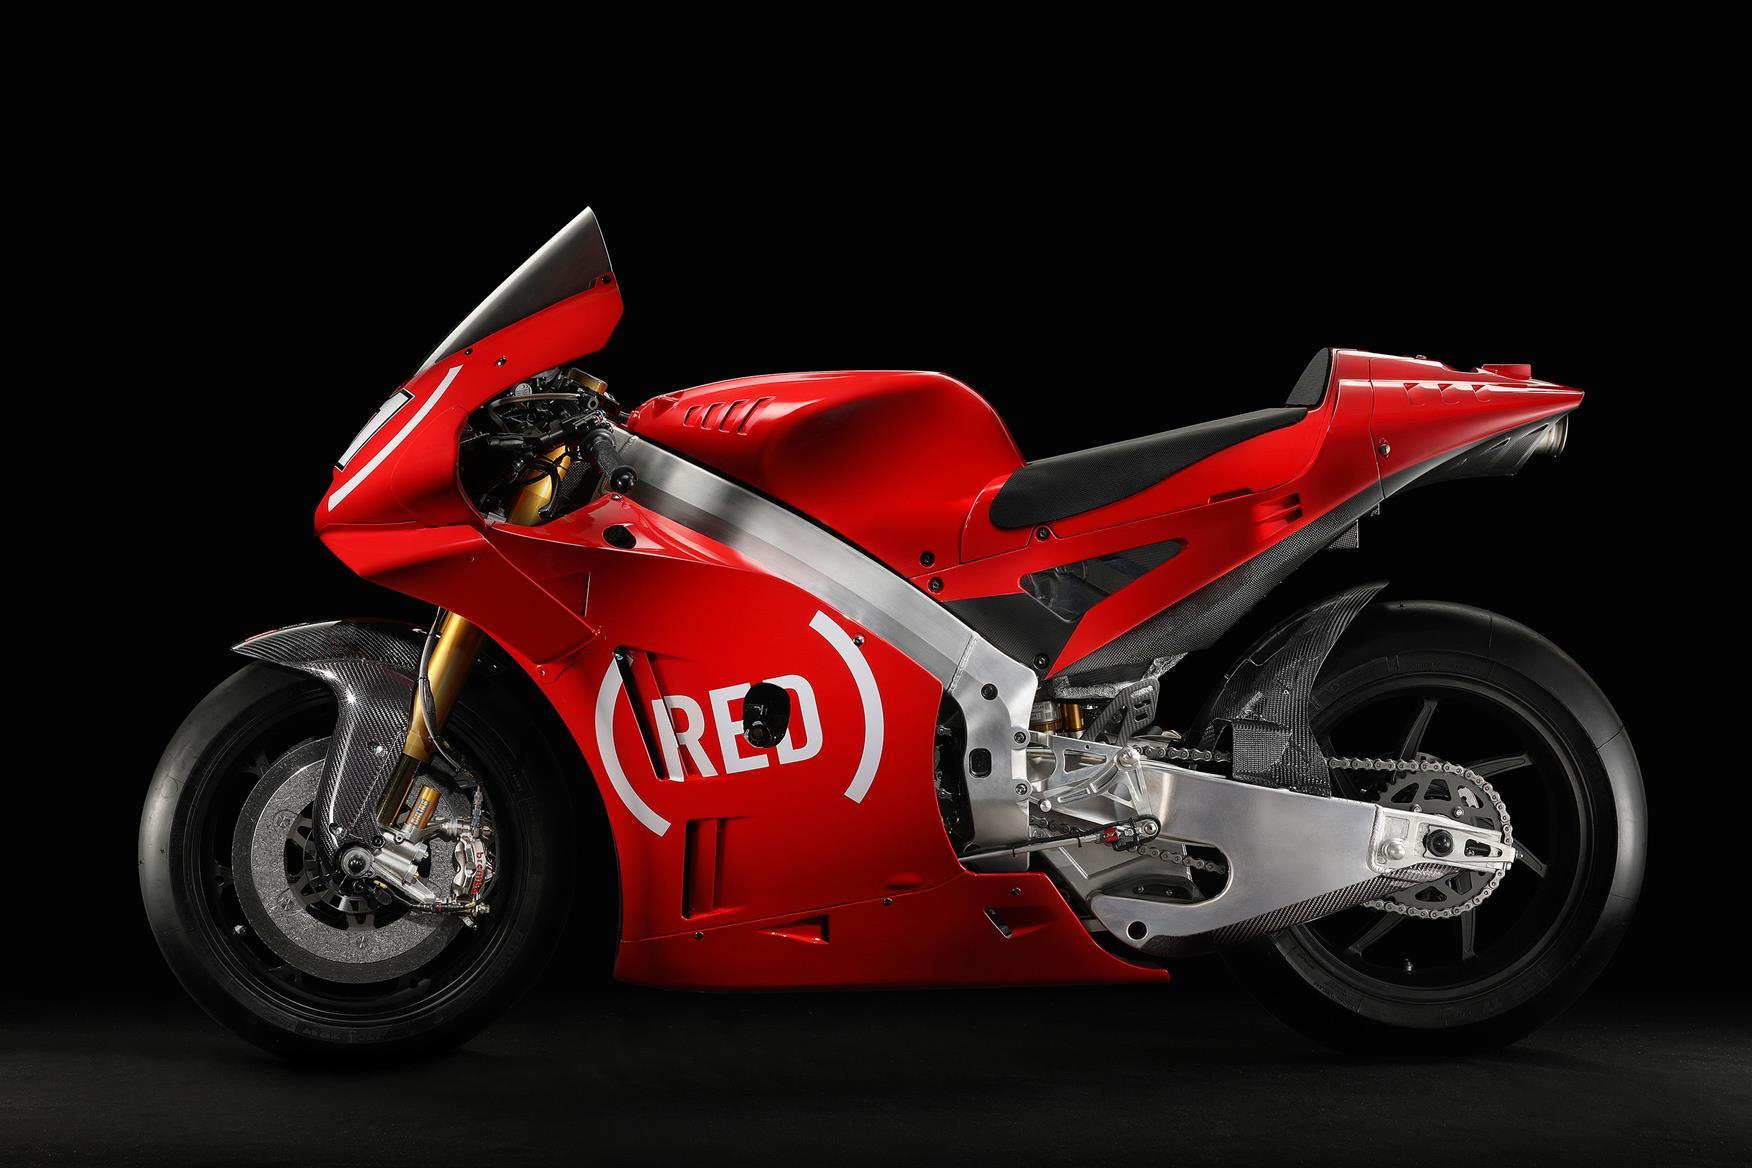 MotoGP: Aprilia renew partnership with charity (RED)